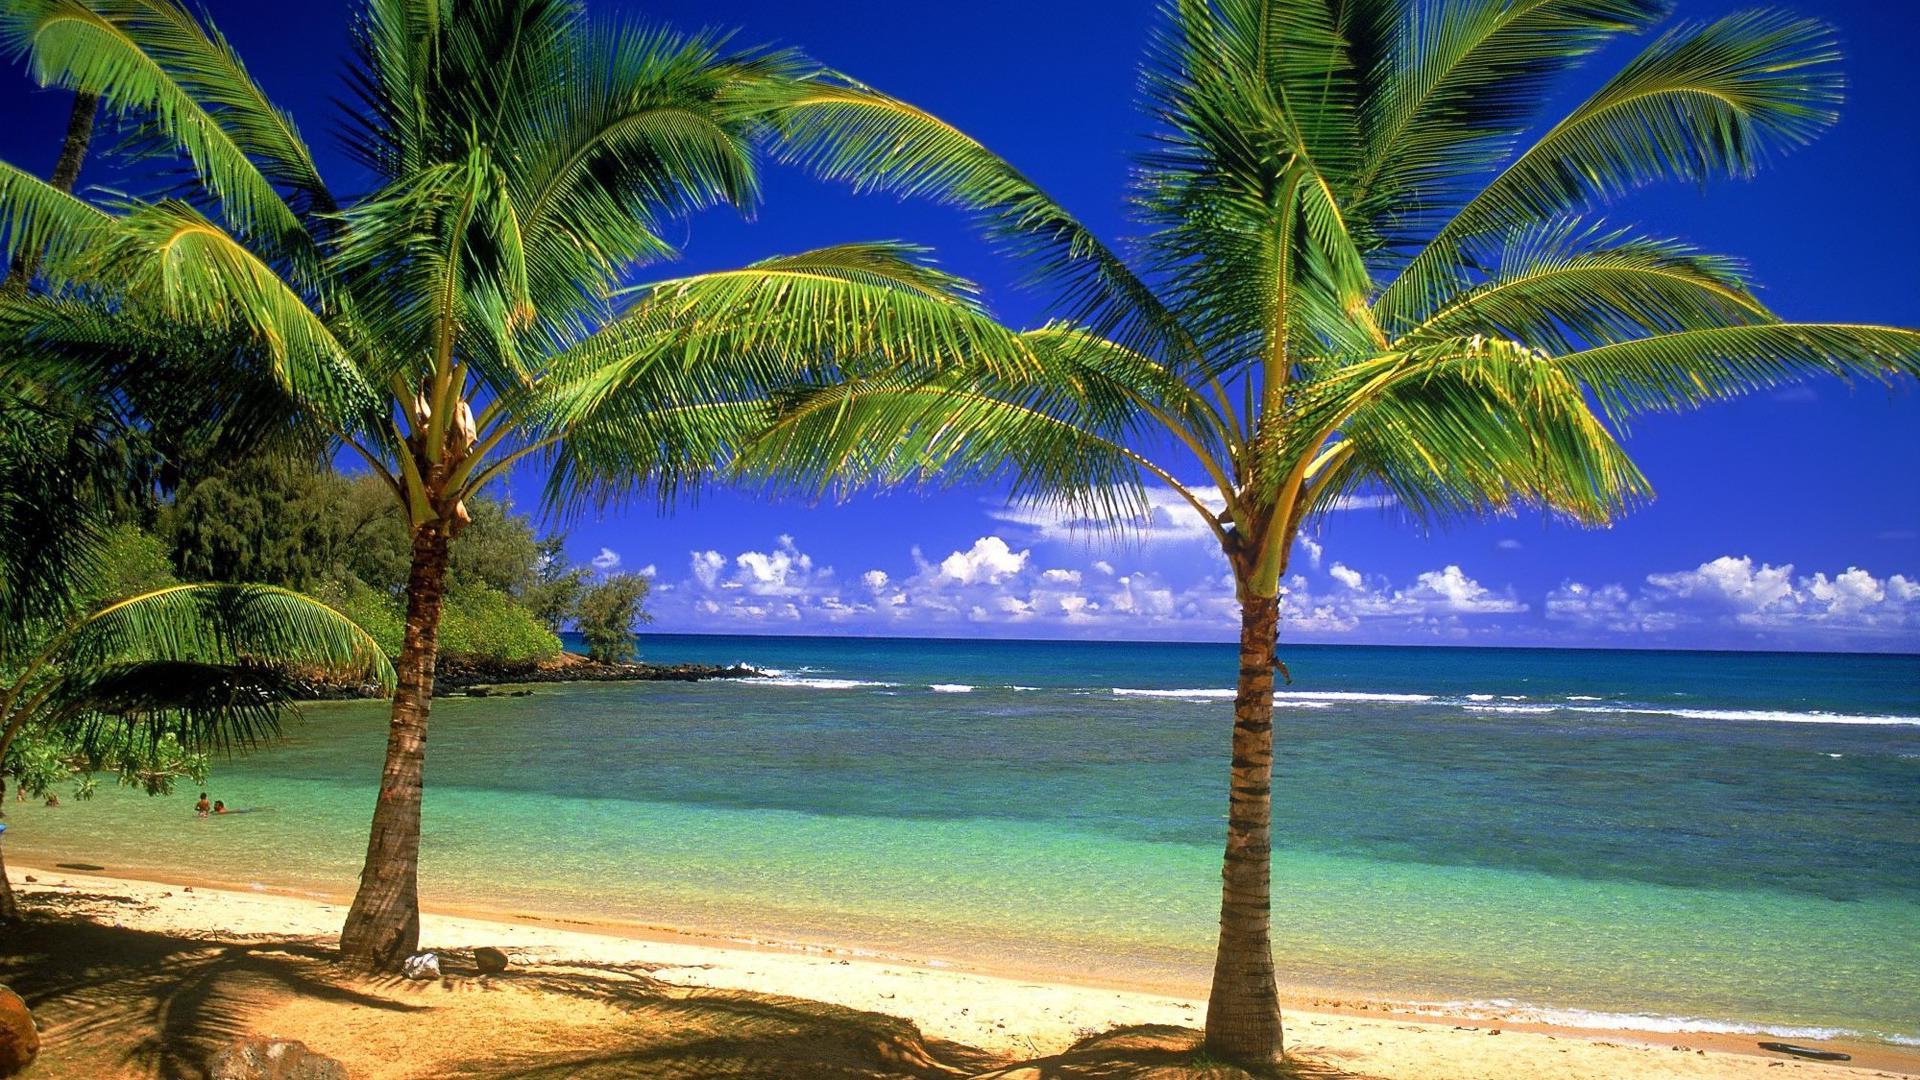 hd beach desktop backgrounds wallpapersafari